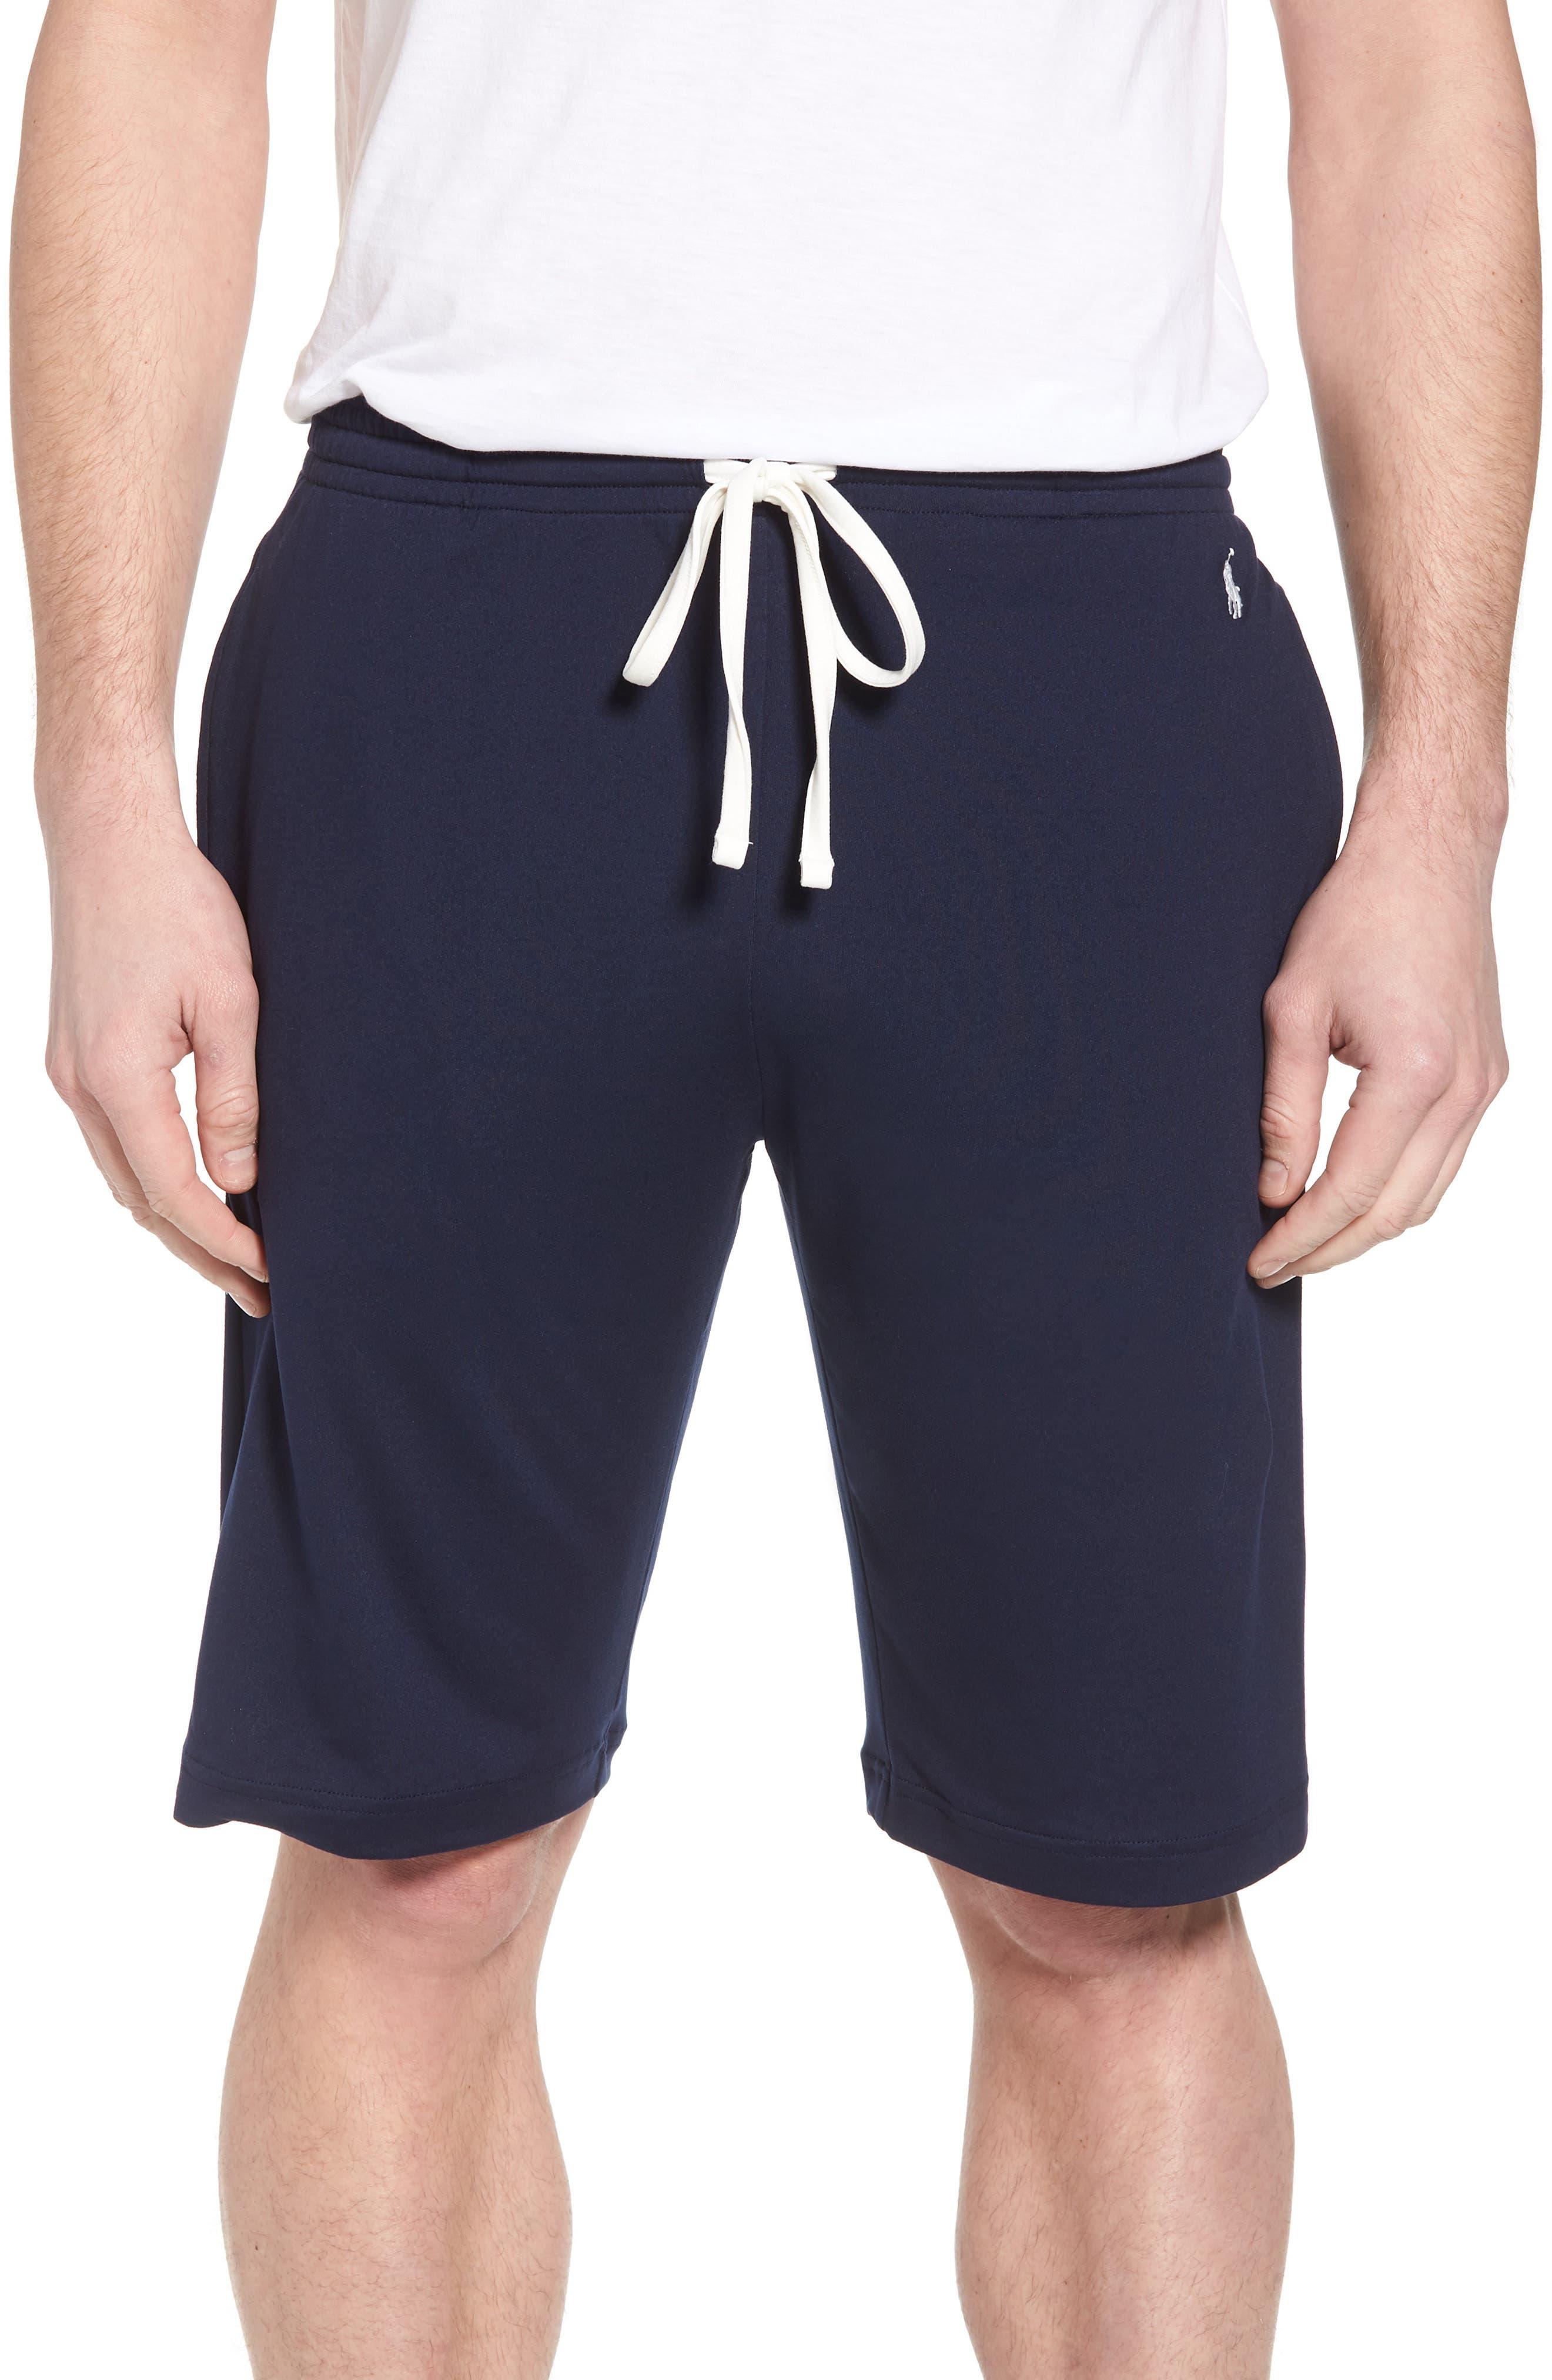 Main Image - Polo Ralph Lauren Therma Lounge Shorts